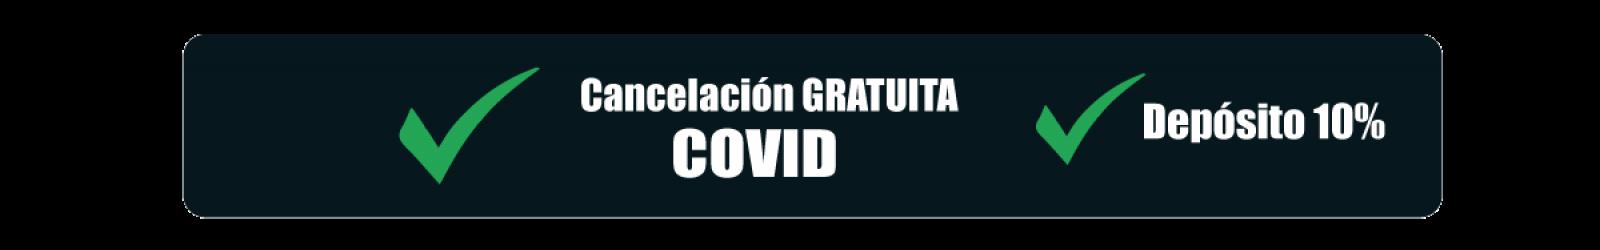 cancela-banner-covid